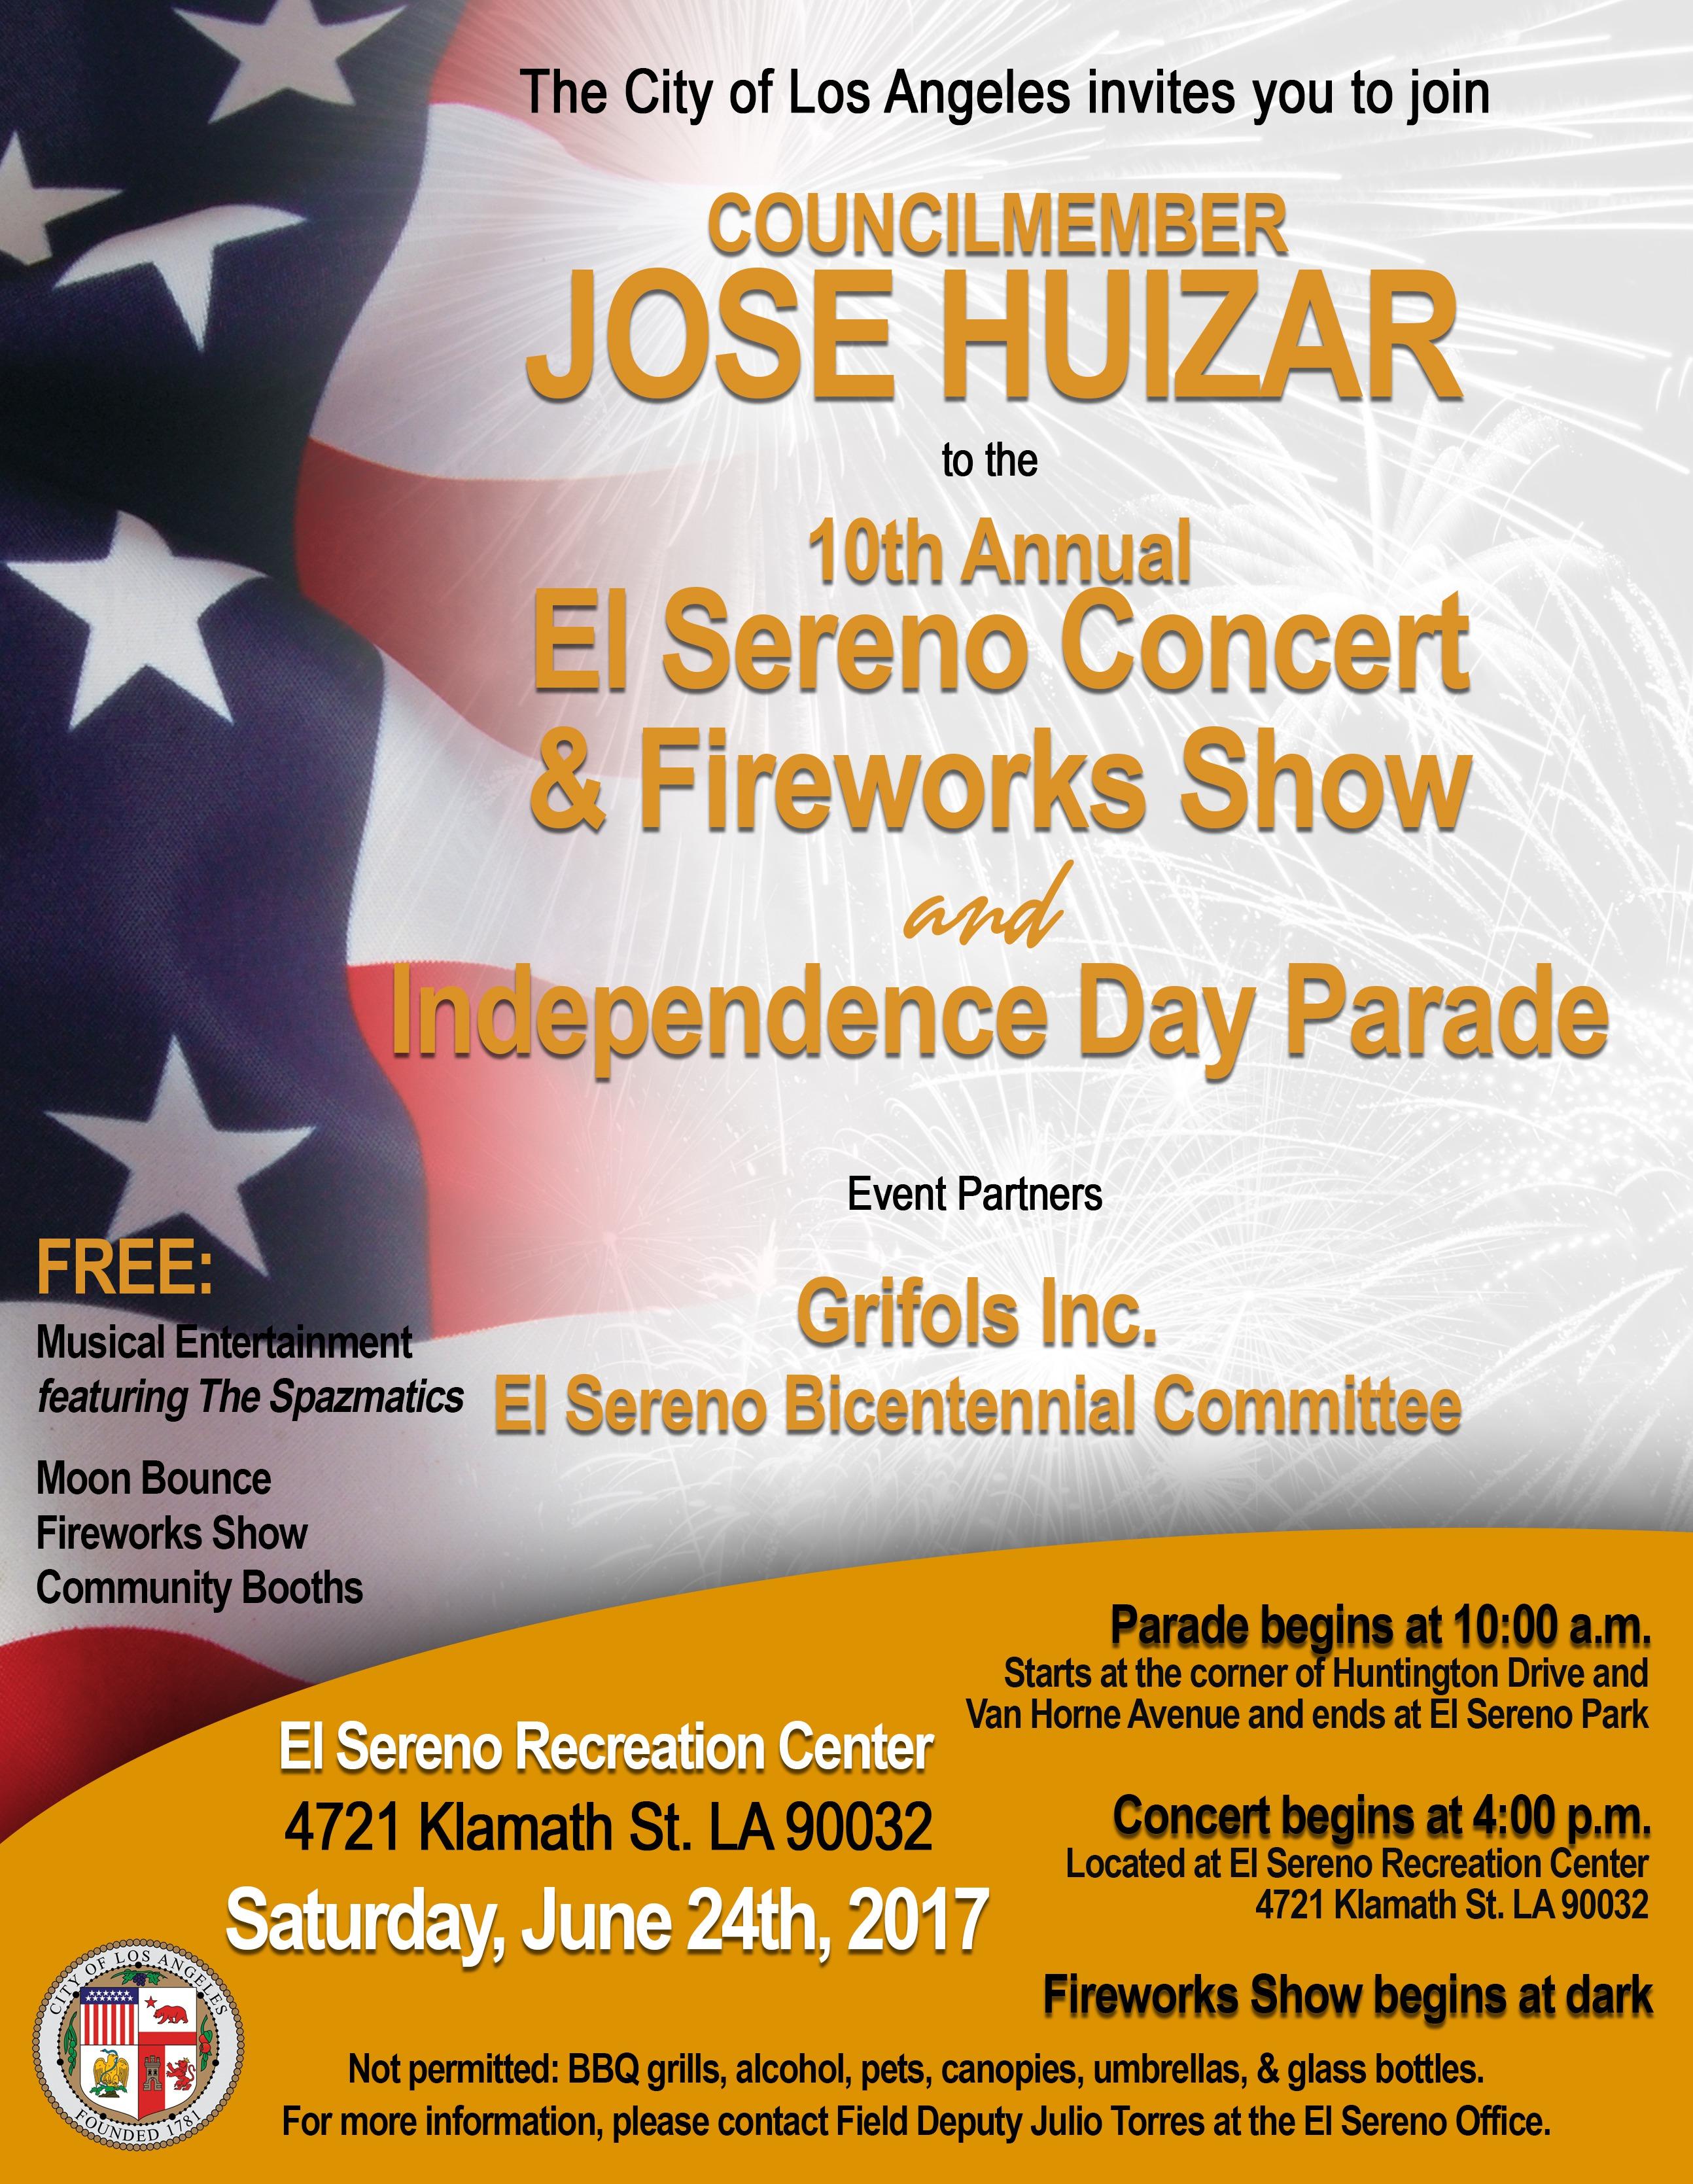 cd14_fireworks_concert_FLYER_8.5x11__El_Sereno-page-0.jpg